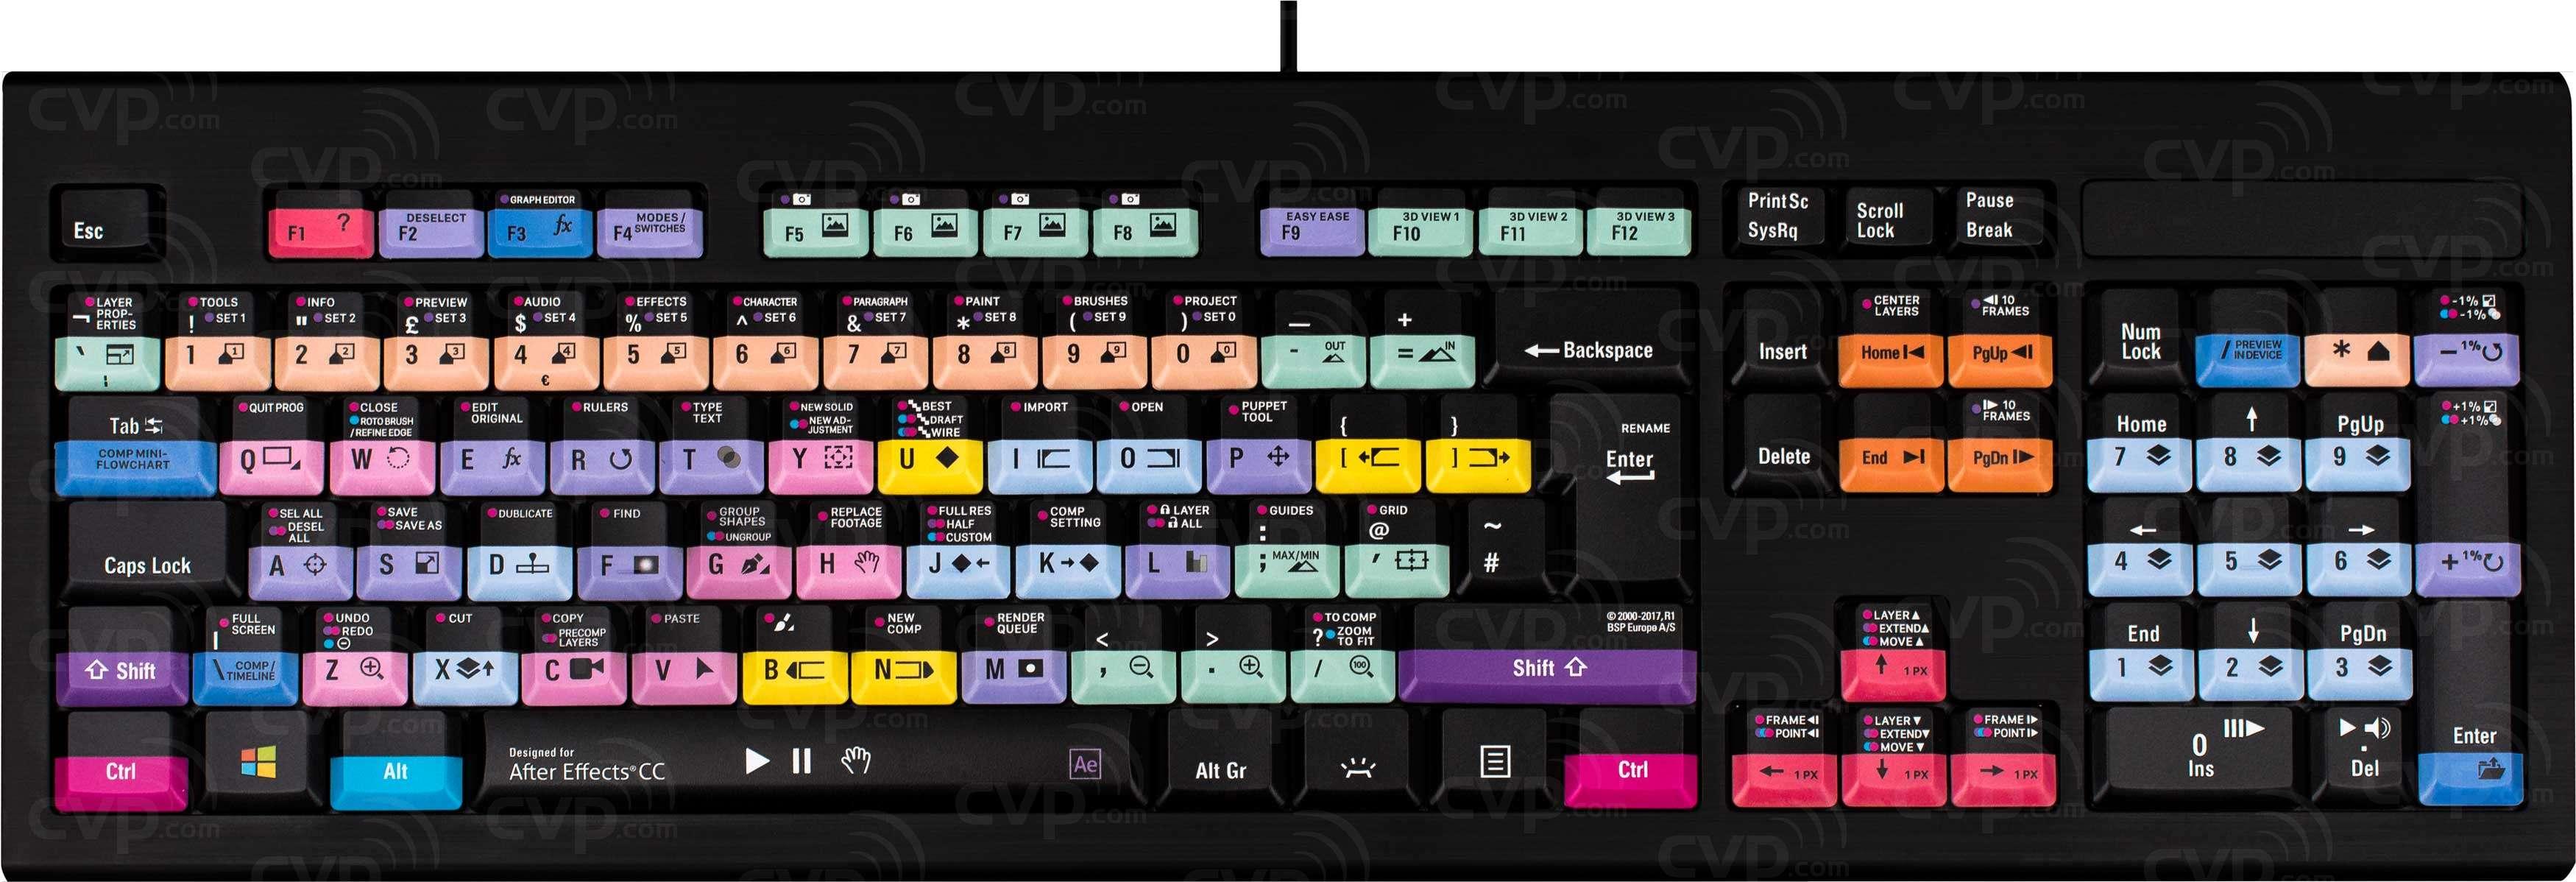 85138242a6c Buy - Logic Keyboard After Effects CC - PC Backlit Astra Keyboard (p/n  LKB-AECC-APBH-UK)